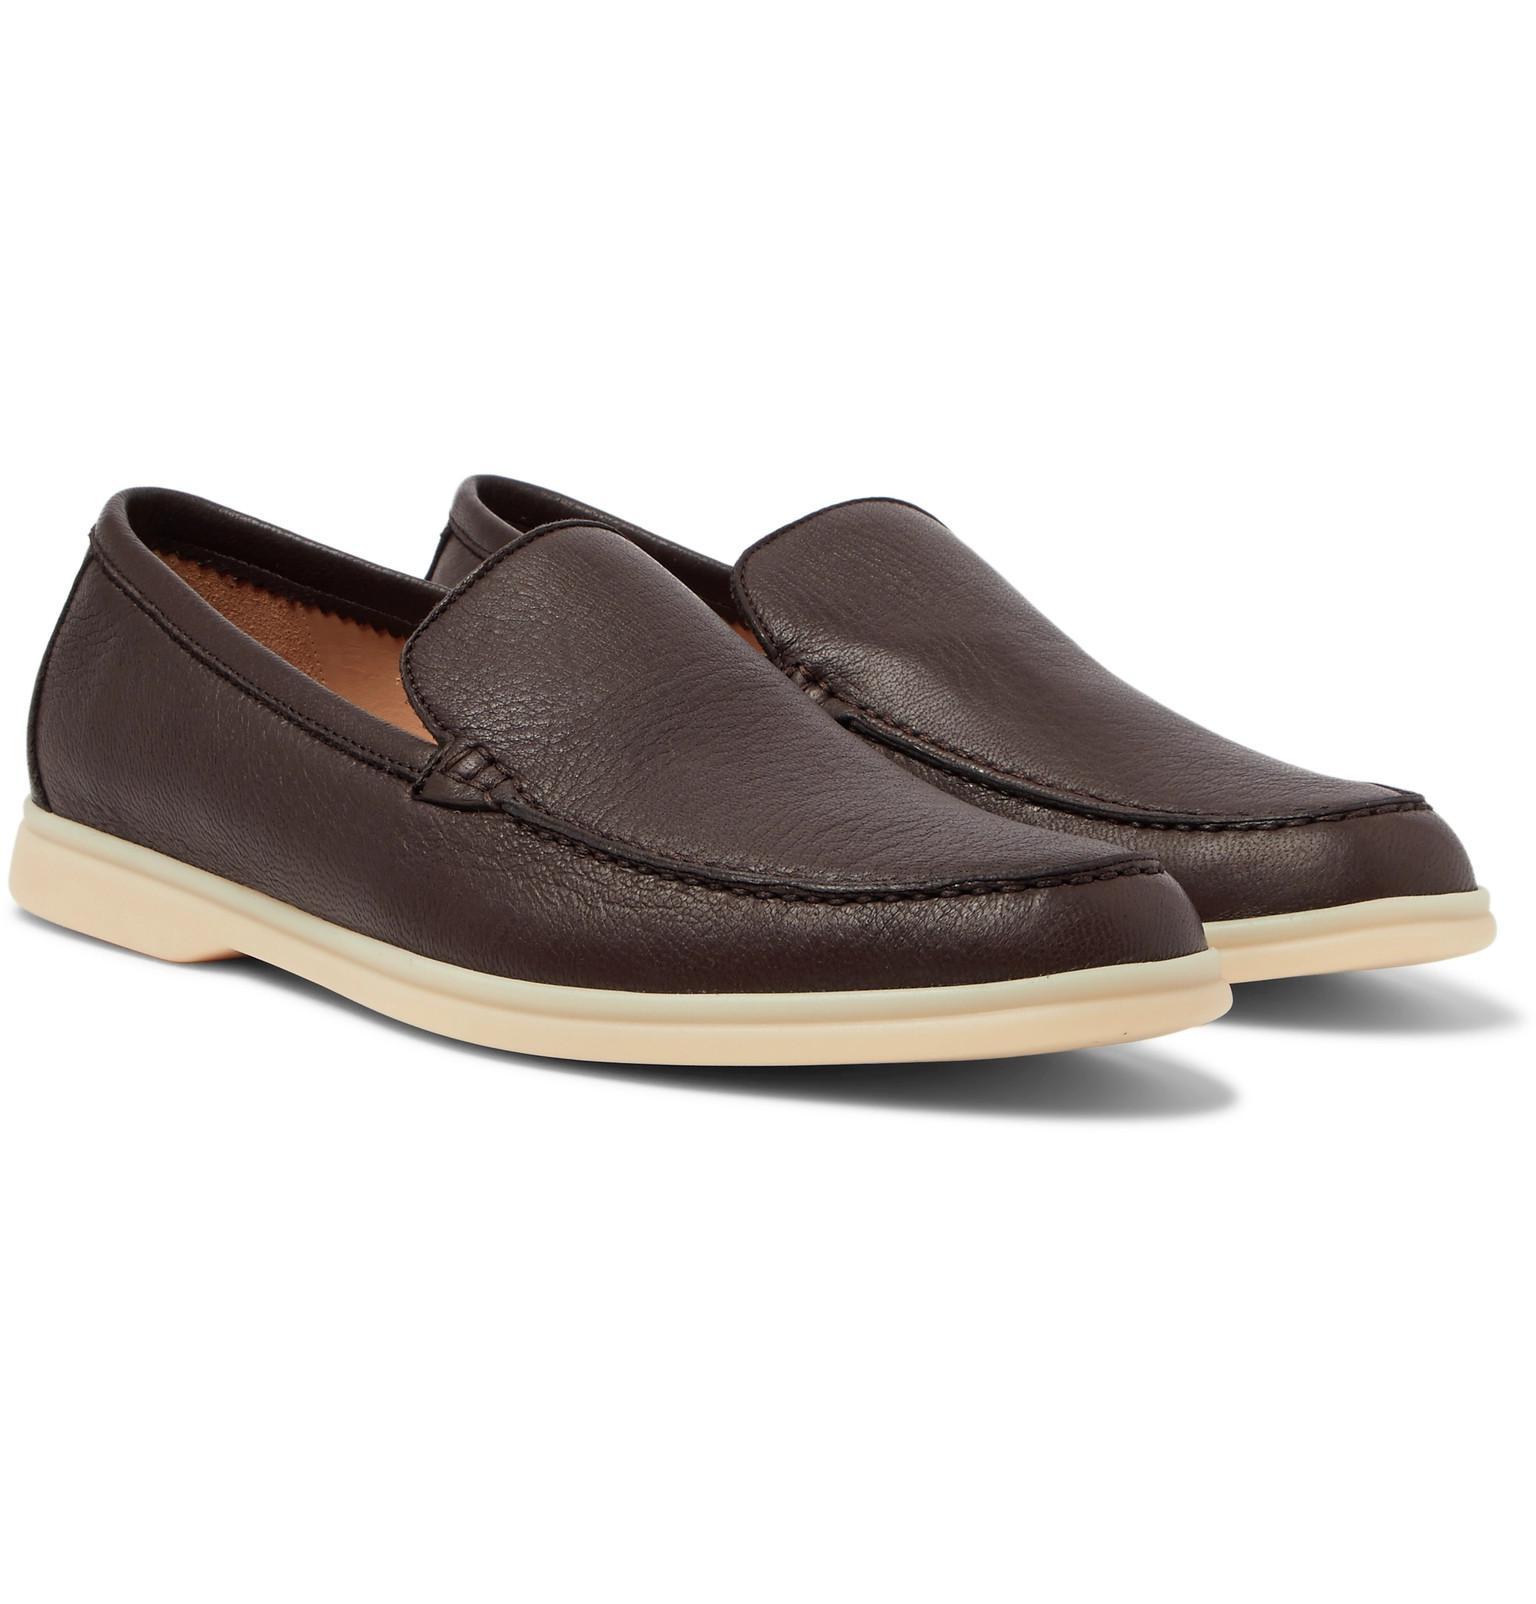 6eecfdc7422 Loro Piana Summer Walk Full-grain Leather Loafers in Brown for Men ...